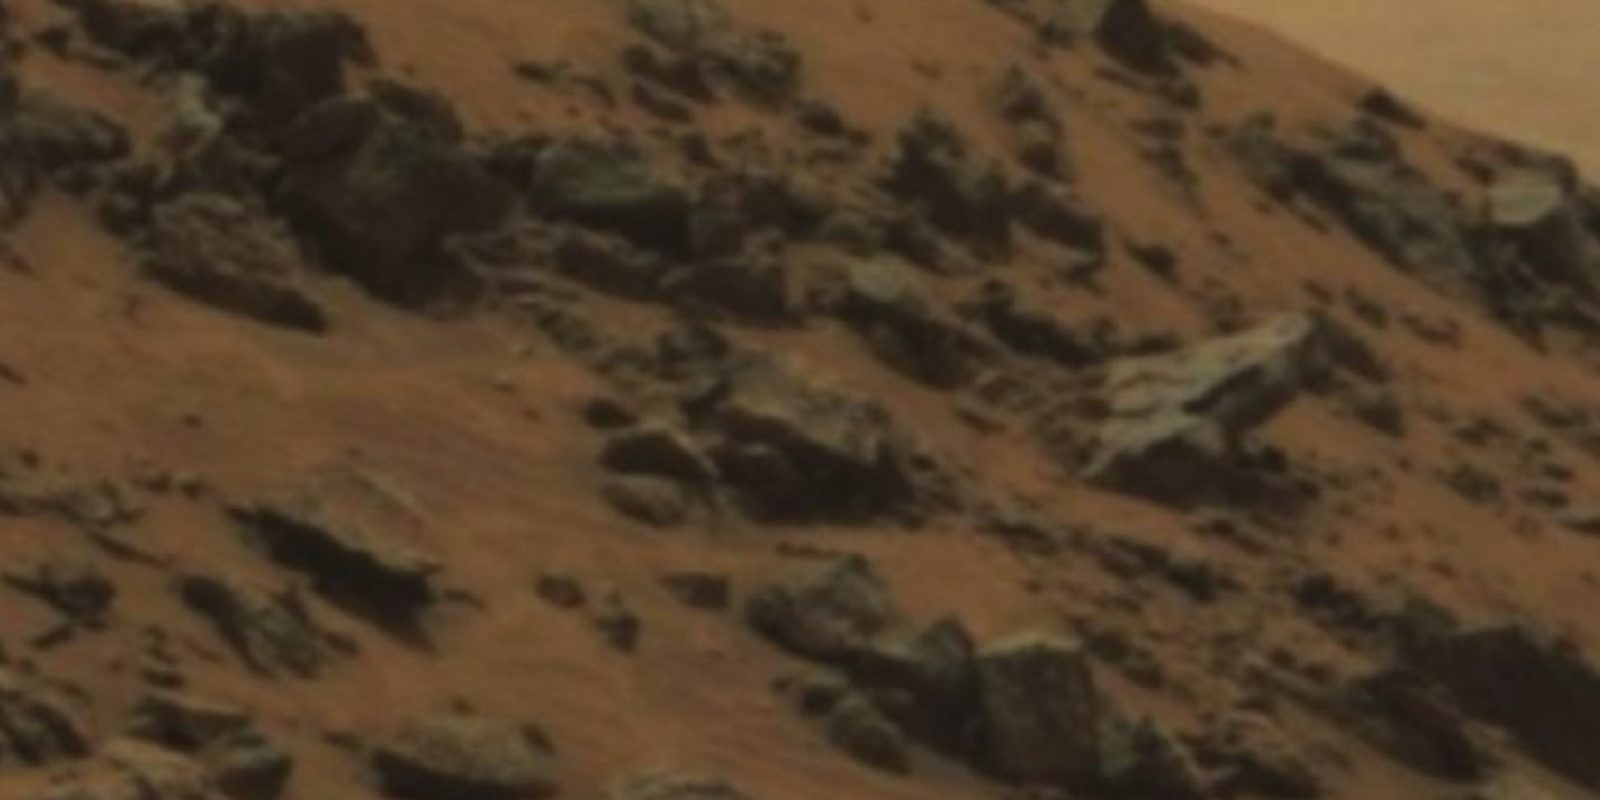 Foto:original en http://mars.nasa.gov/msl/multimedia/raw/?rawid=0978MR0043250040502821E01_DXXX&s=978